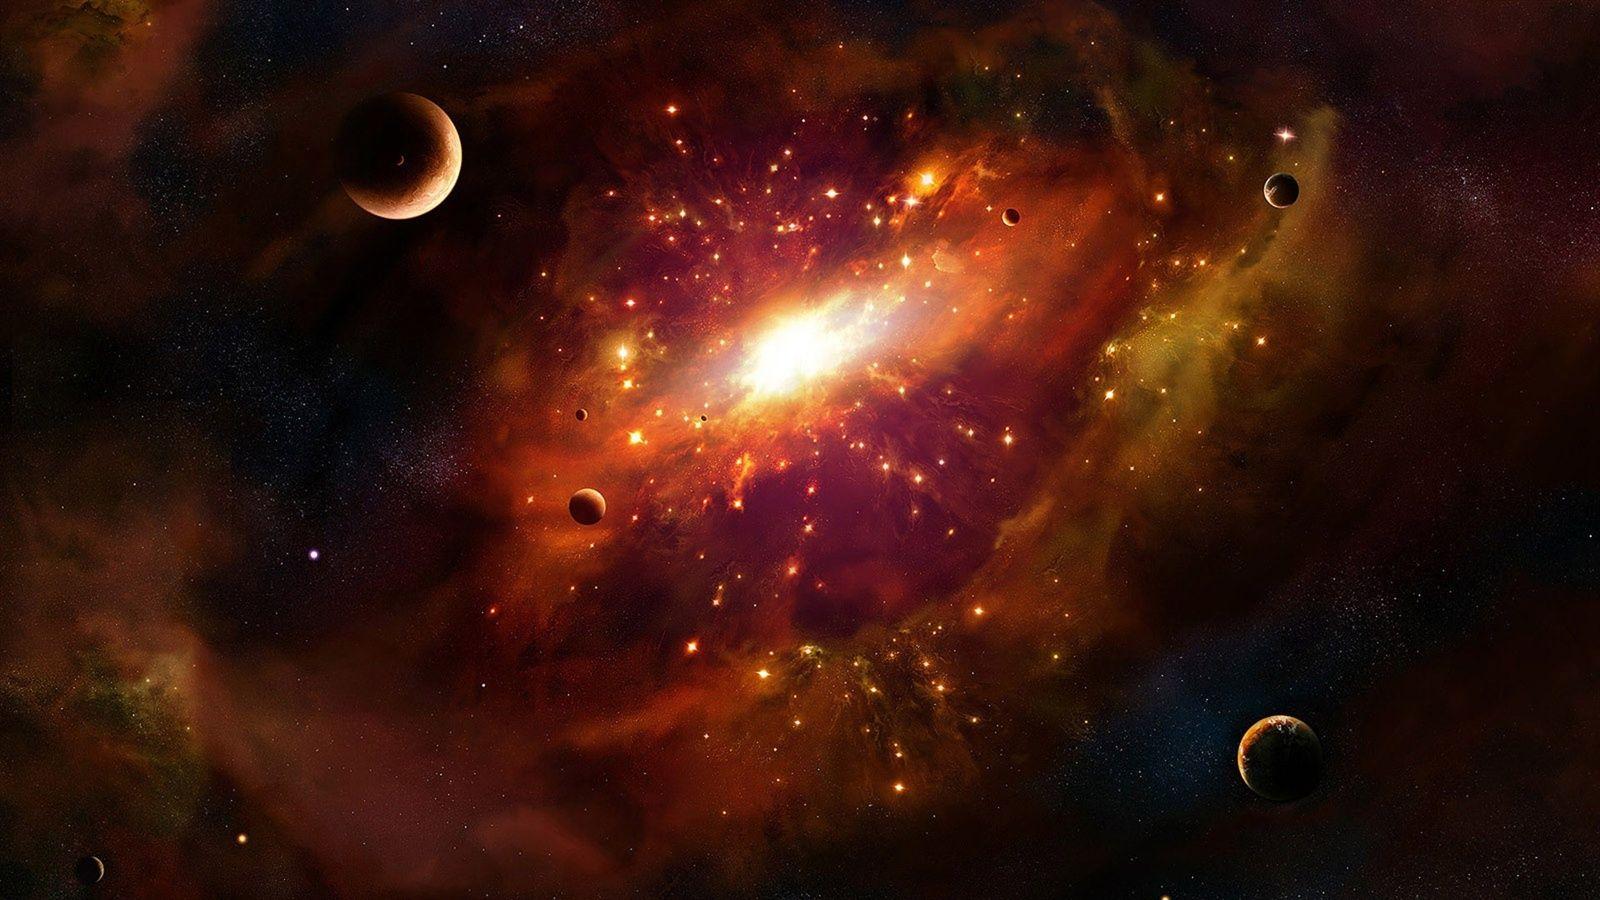 Supernova Explosion Wallpaper 1600x900 Resolution Wallpaper Download Best Wallpaper Net Nebula Galaxies Wallpaper Hd Galaxy Wallpaper